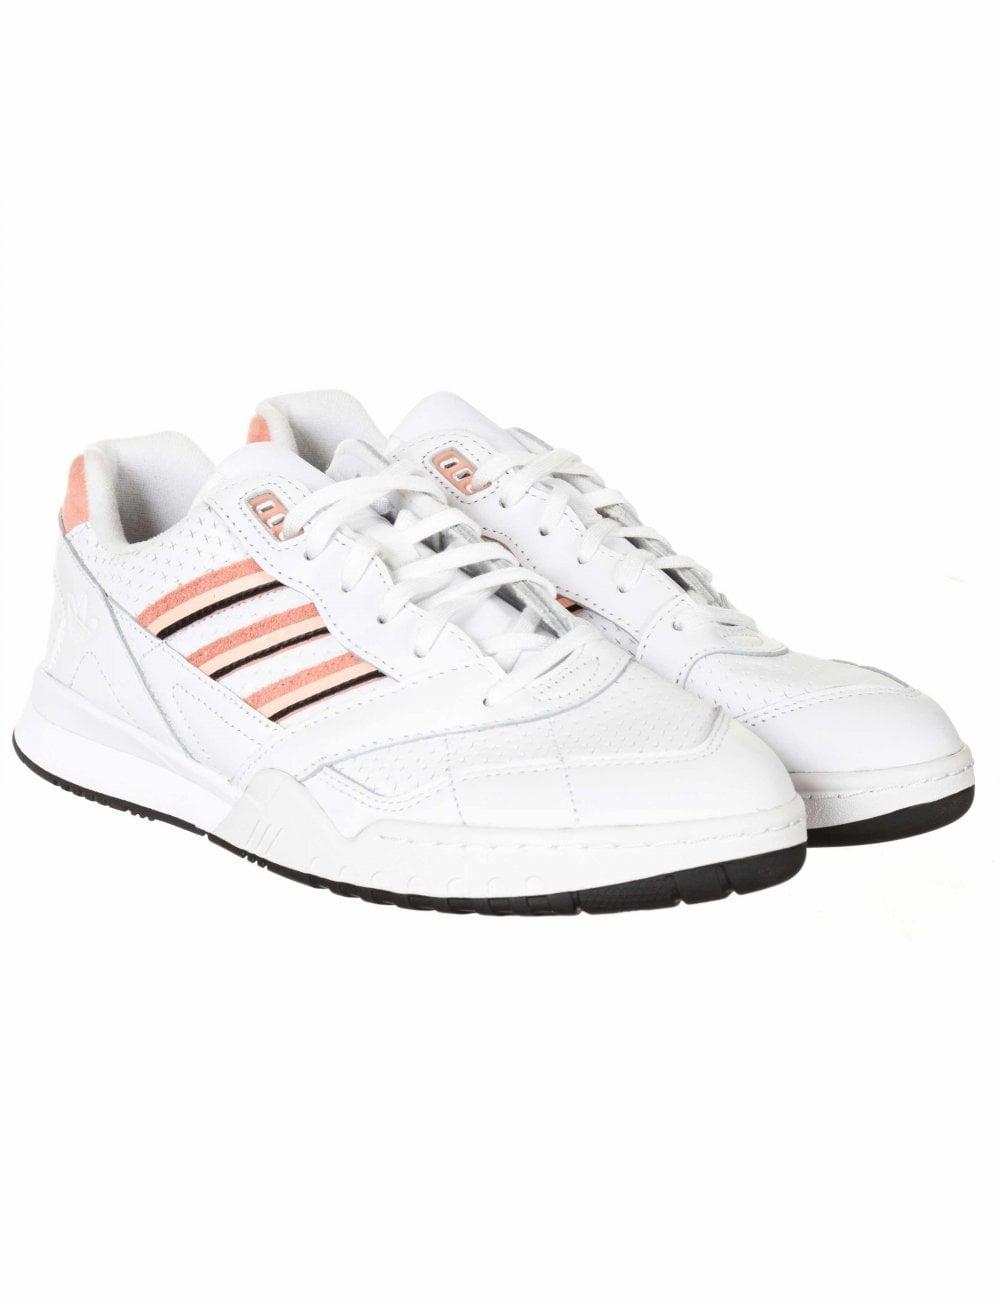 adidas A.R. Trainer (White Pink Black)